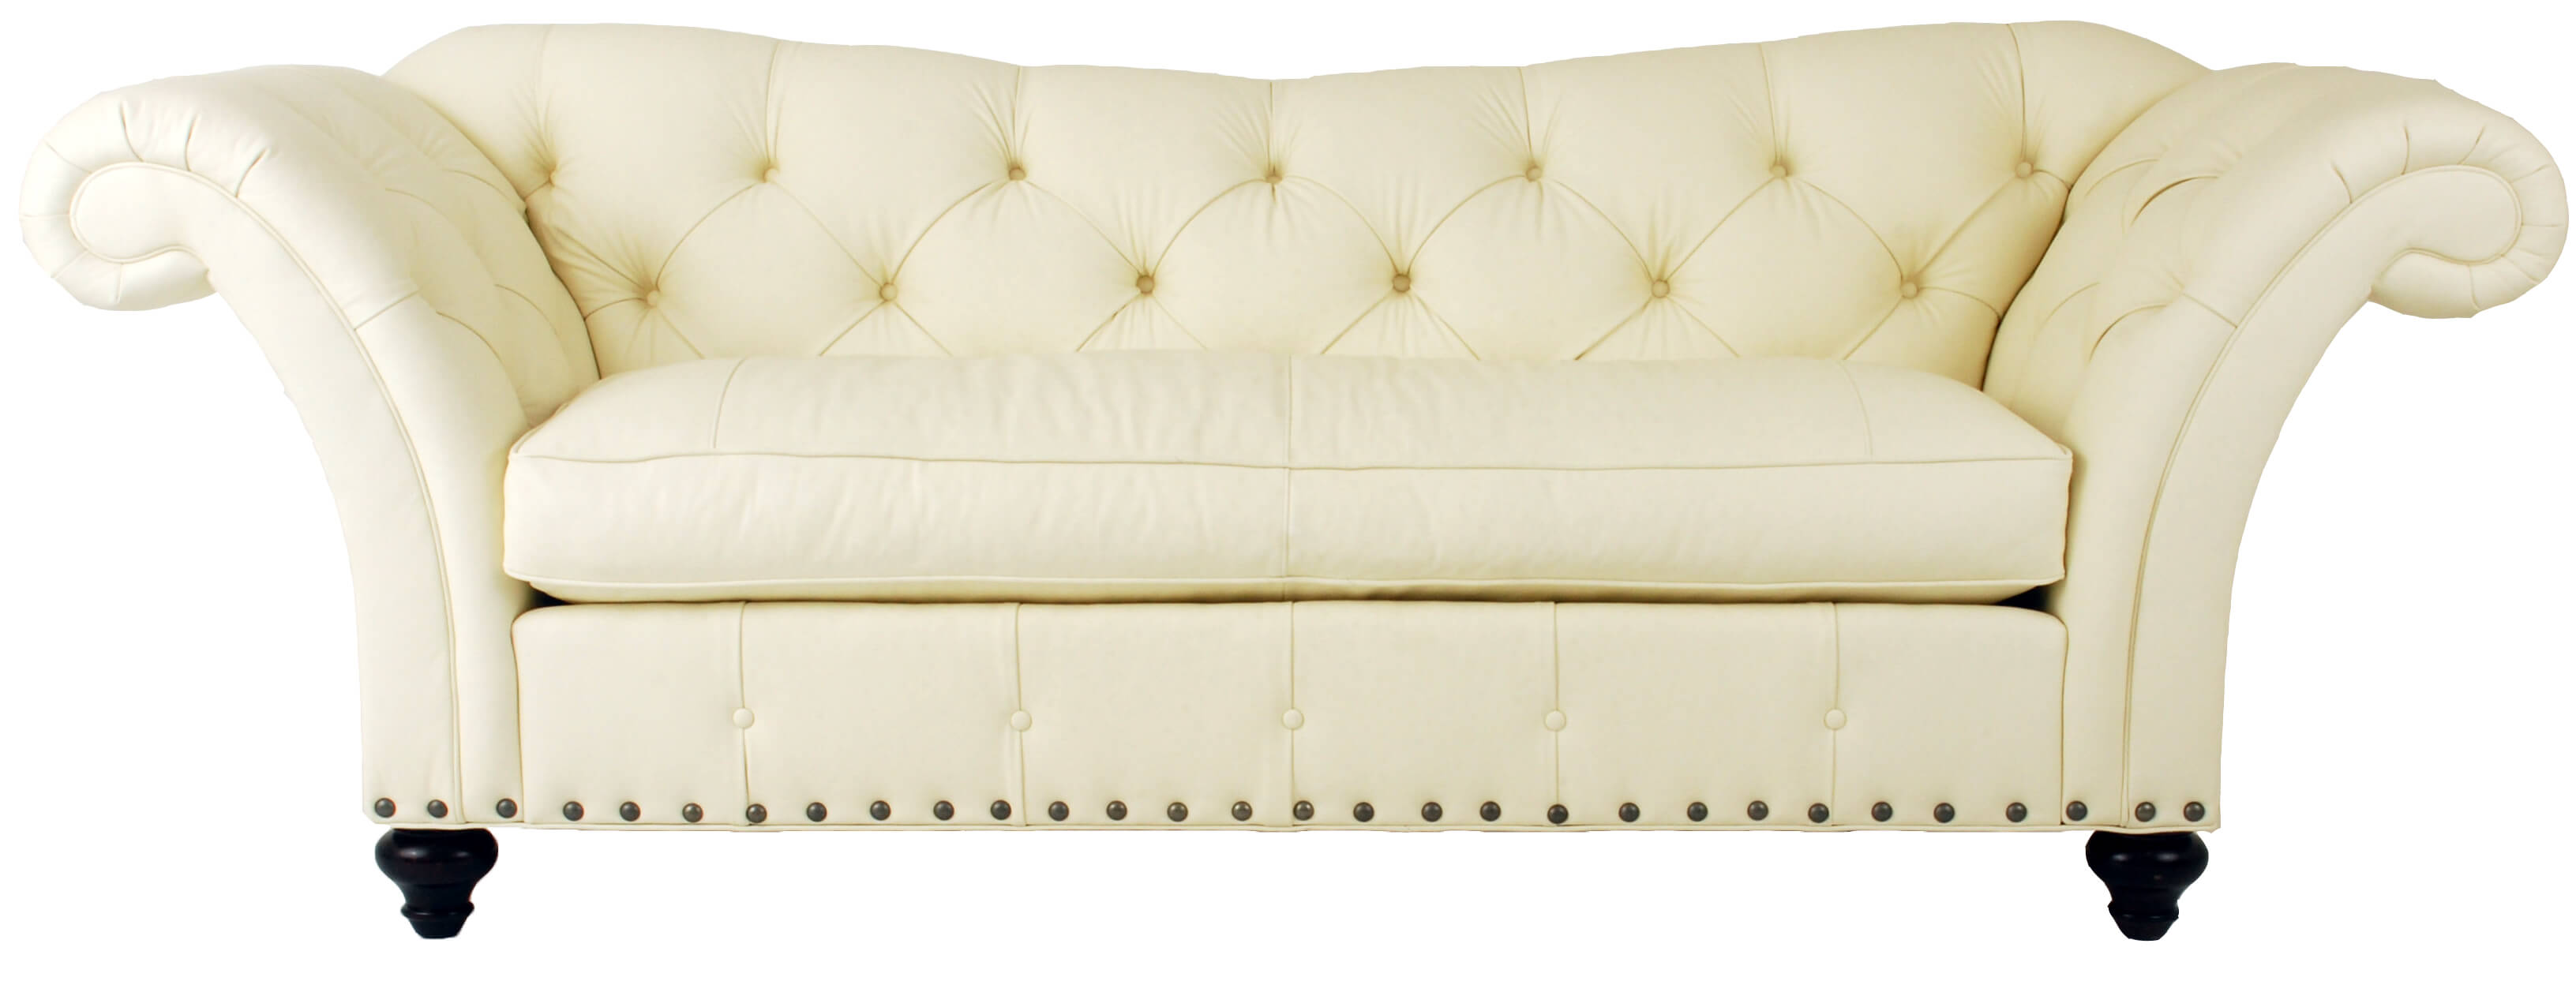 Lola 1165-70 Sofa_New Classic